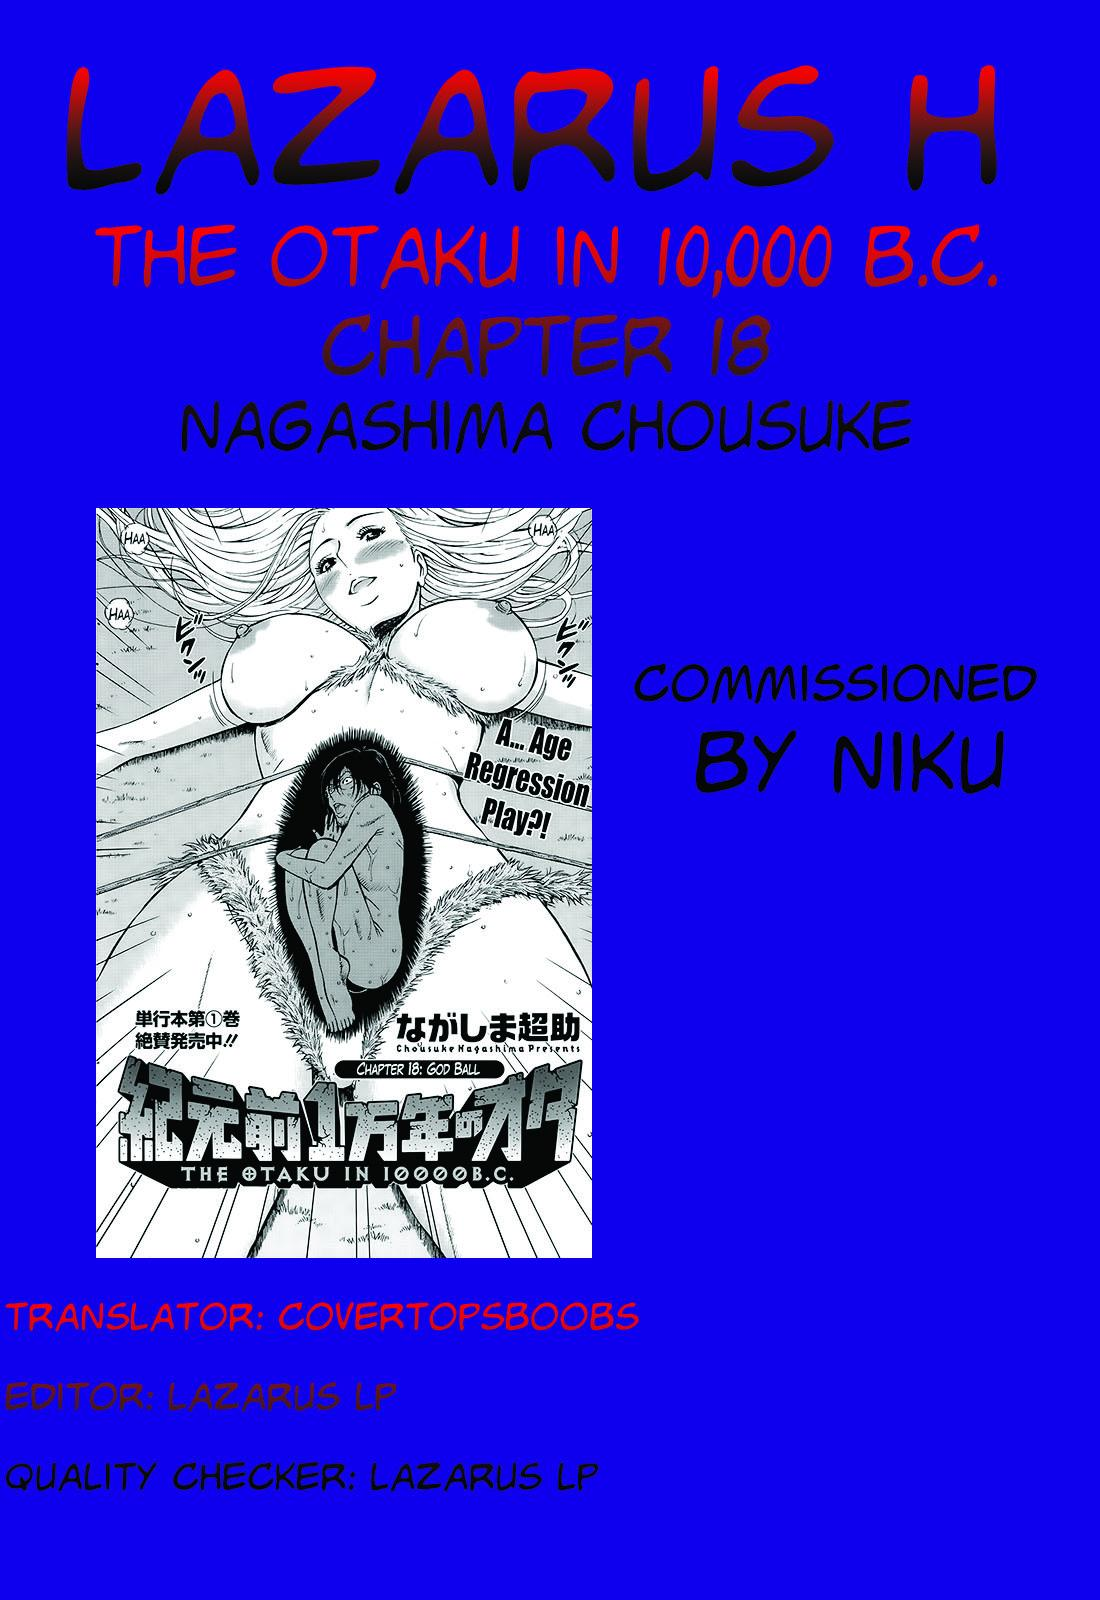 Kigenzen 10000 Nen no Ota | The Otaku in 10,000 B.C. 344